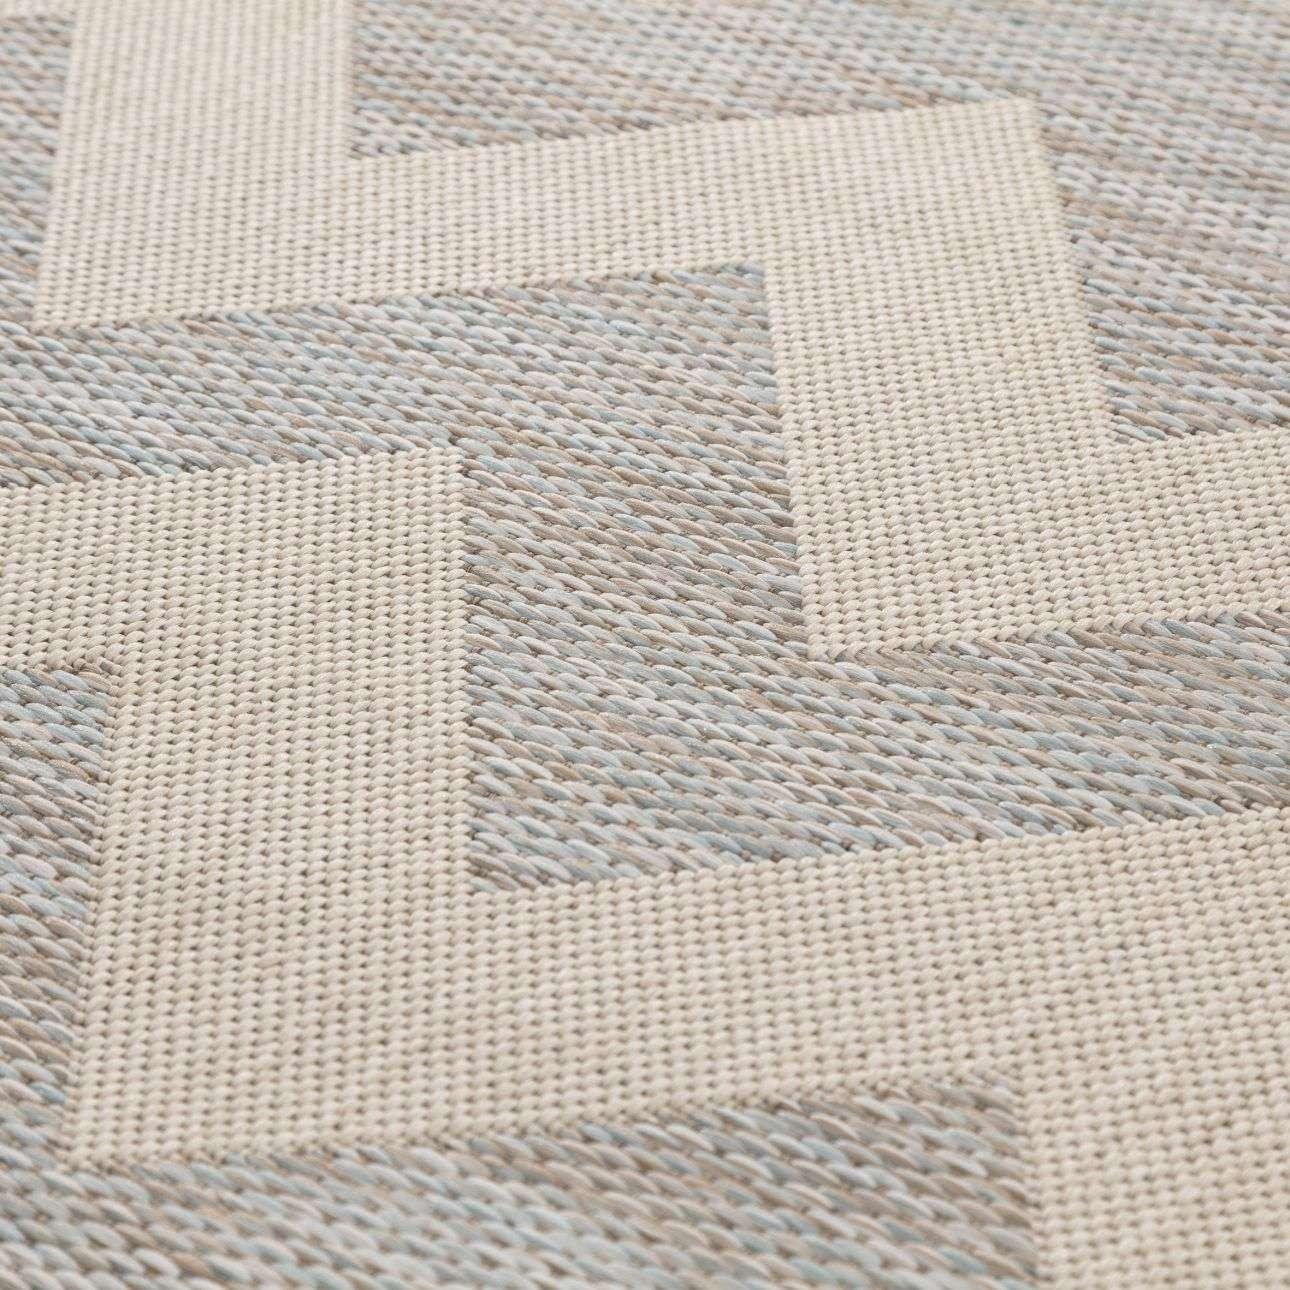 Teppich Modern Chevron wool/ ice blue 160x230 cm